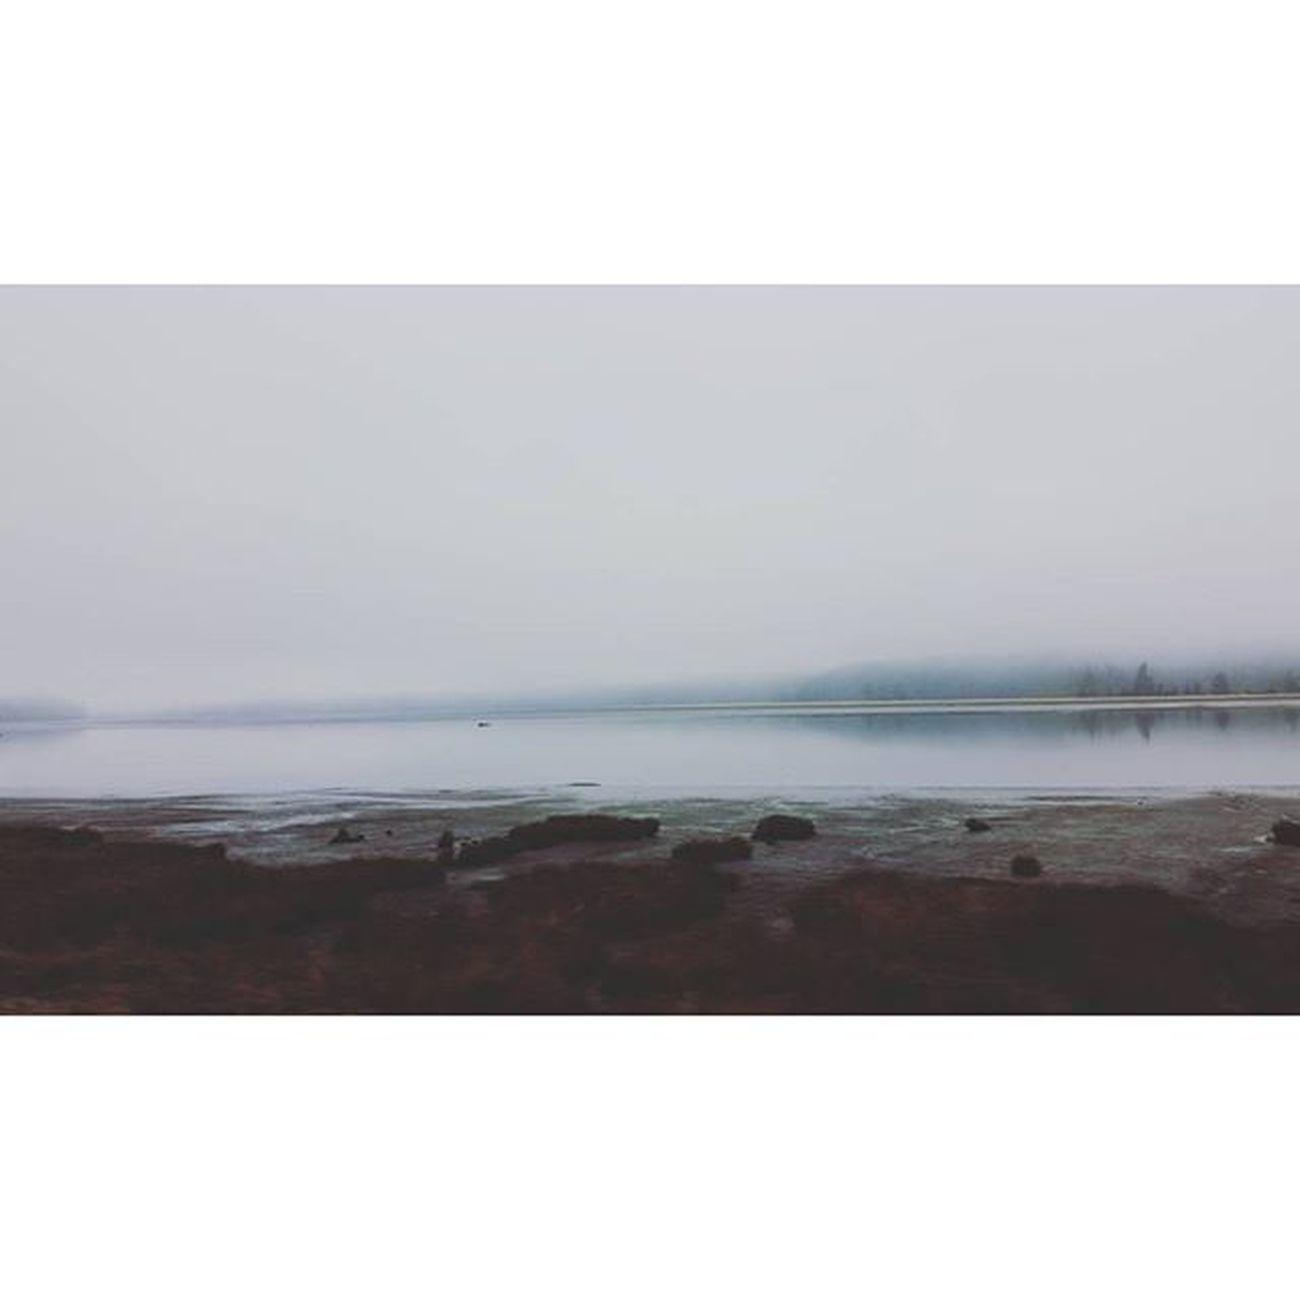 Foggyfallmornings